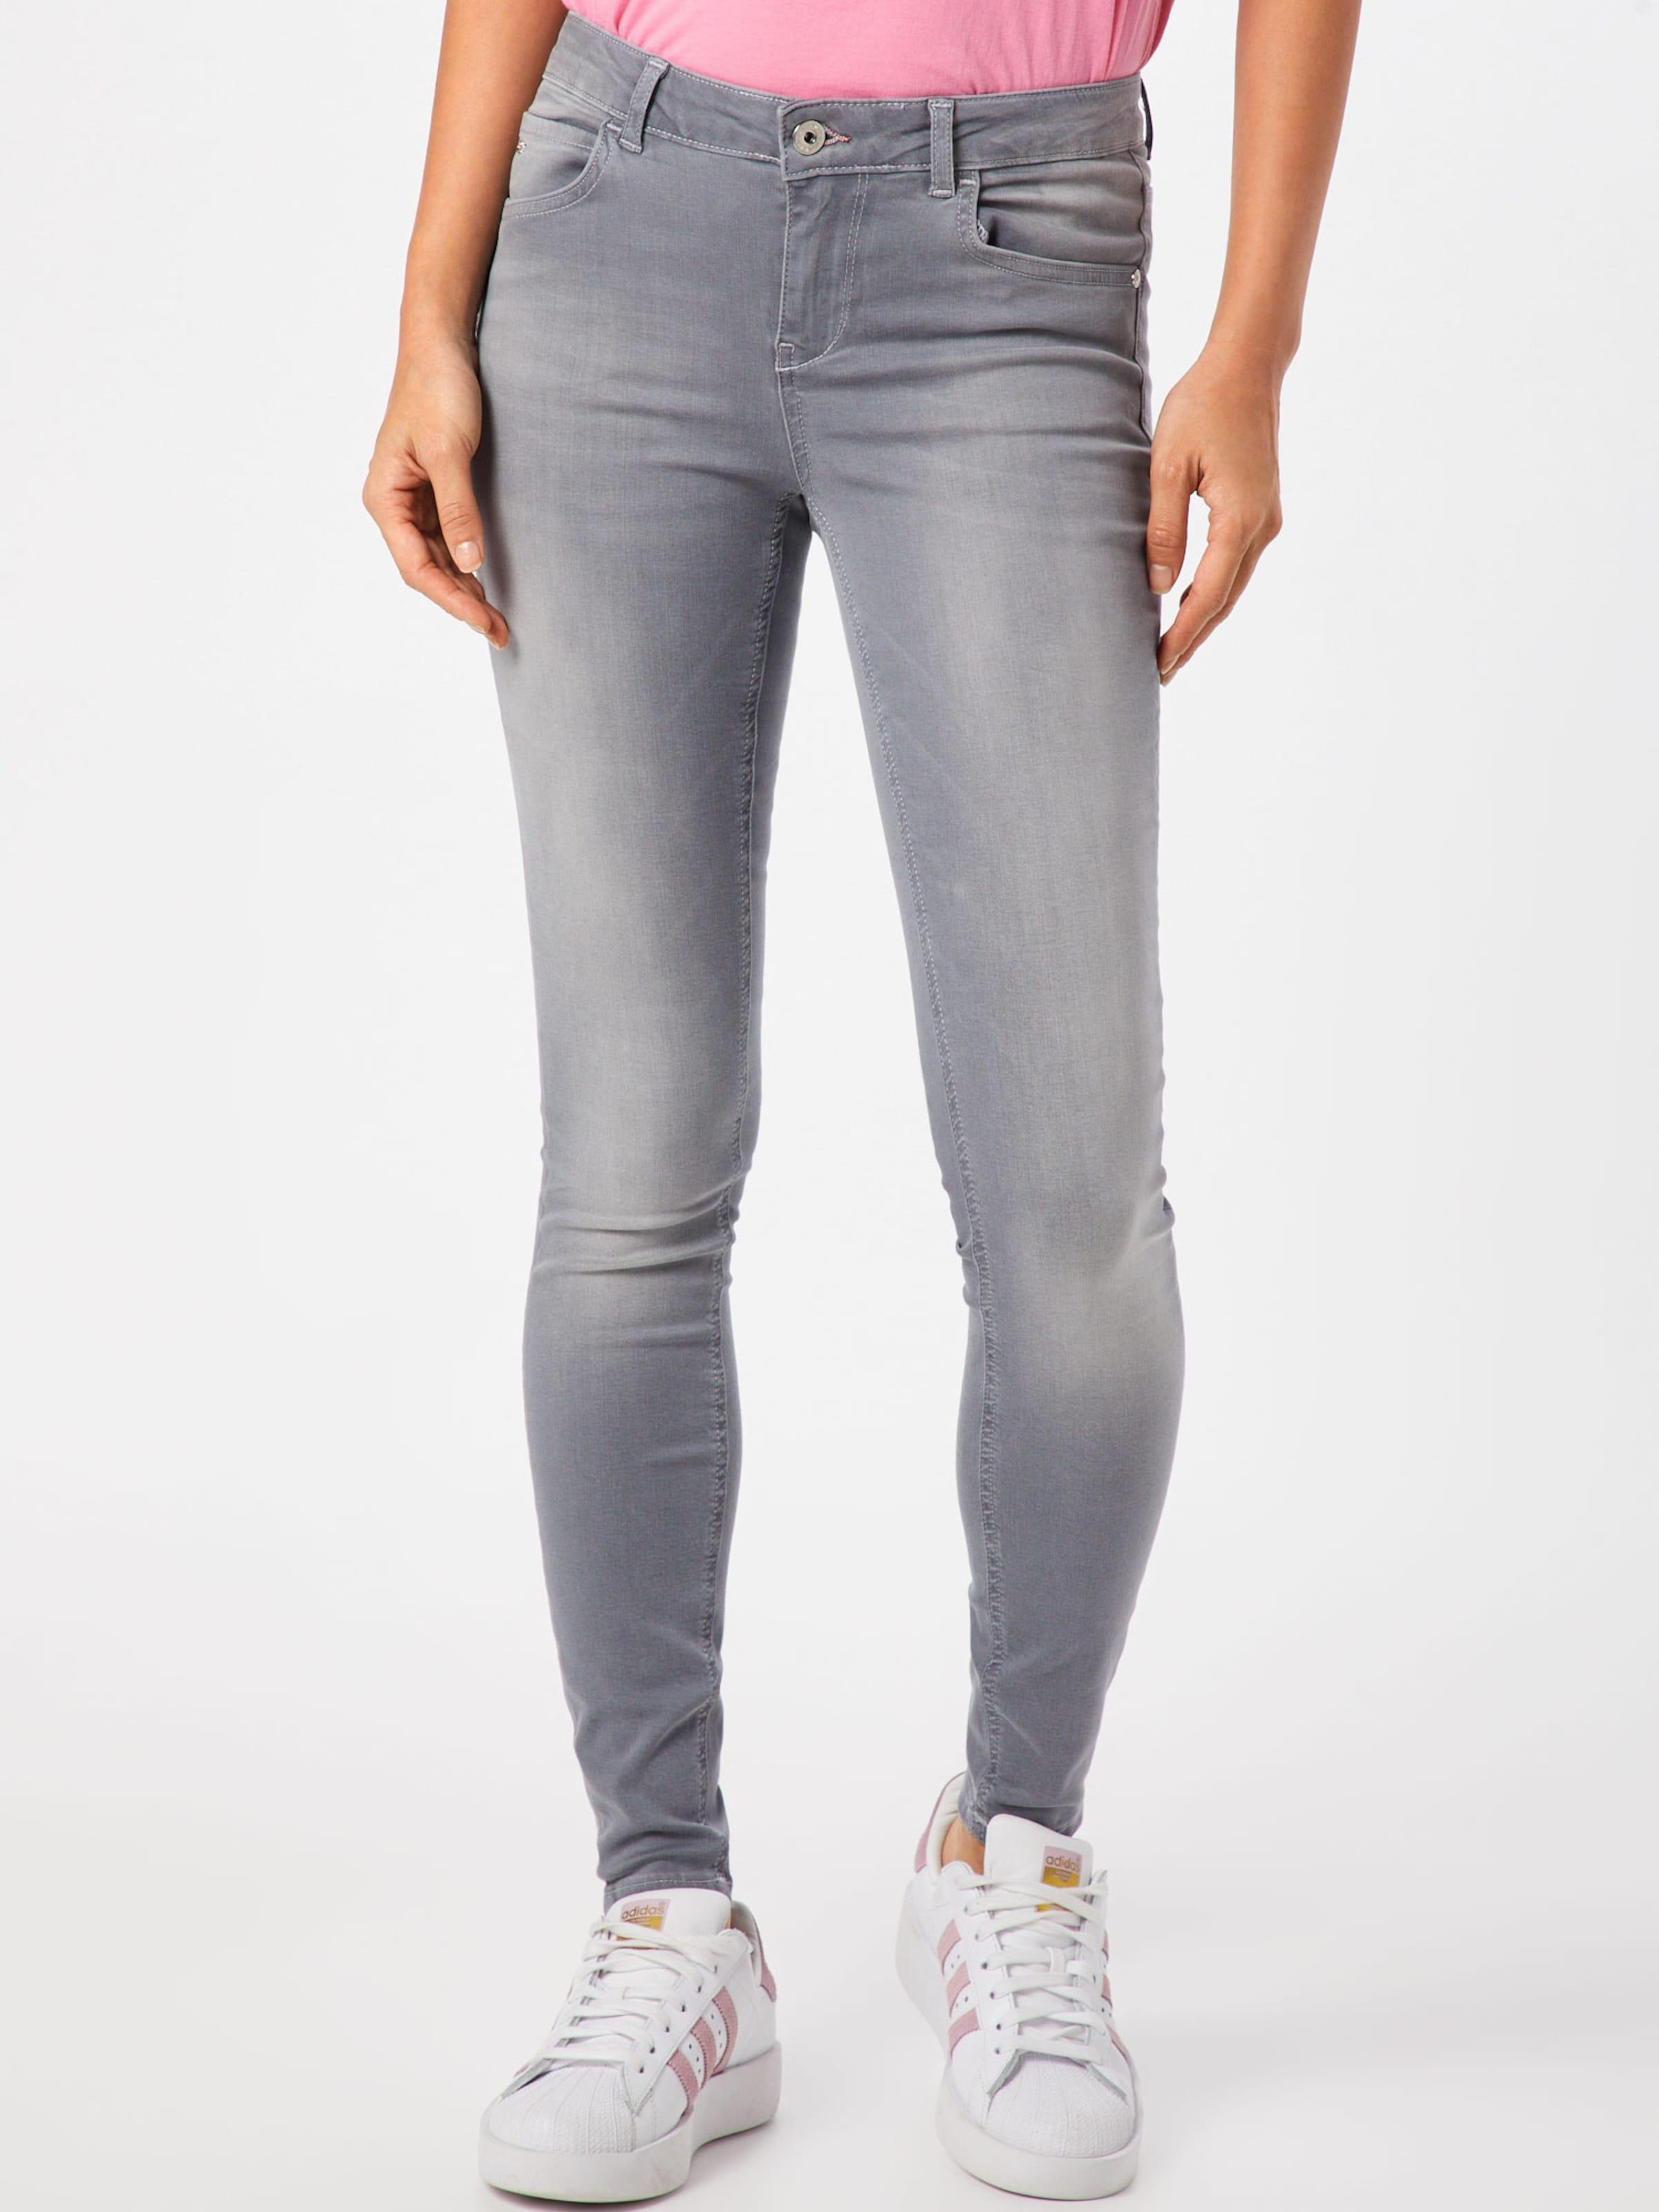 Preußen Yoga' In Grau 'downey Fritzi Aus Jeans 3Lqj54AR